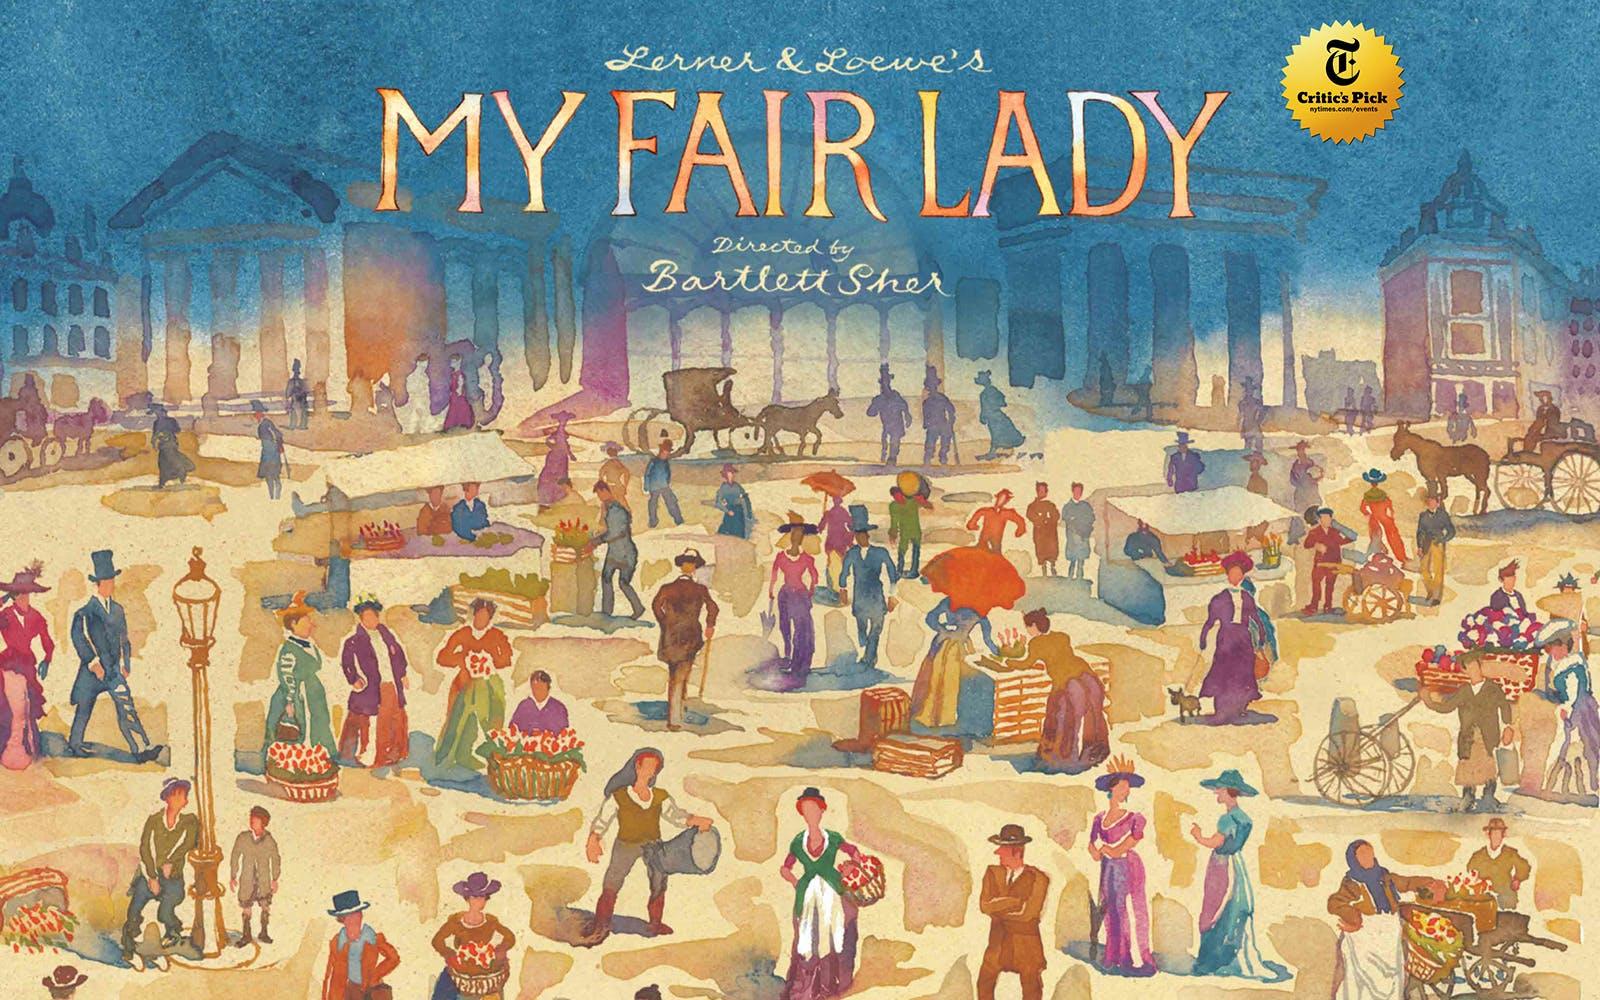 Broadway Week - My fair lady